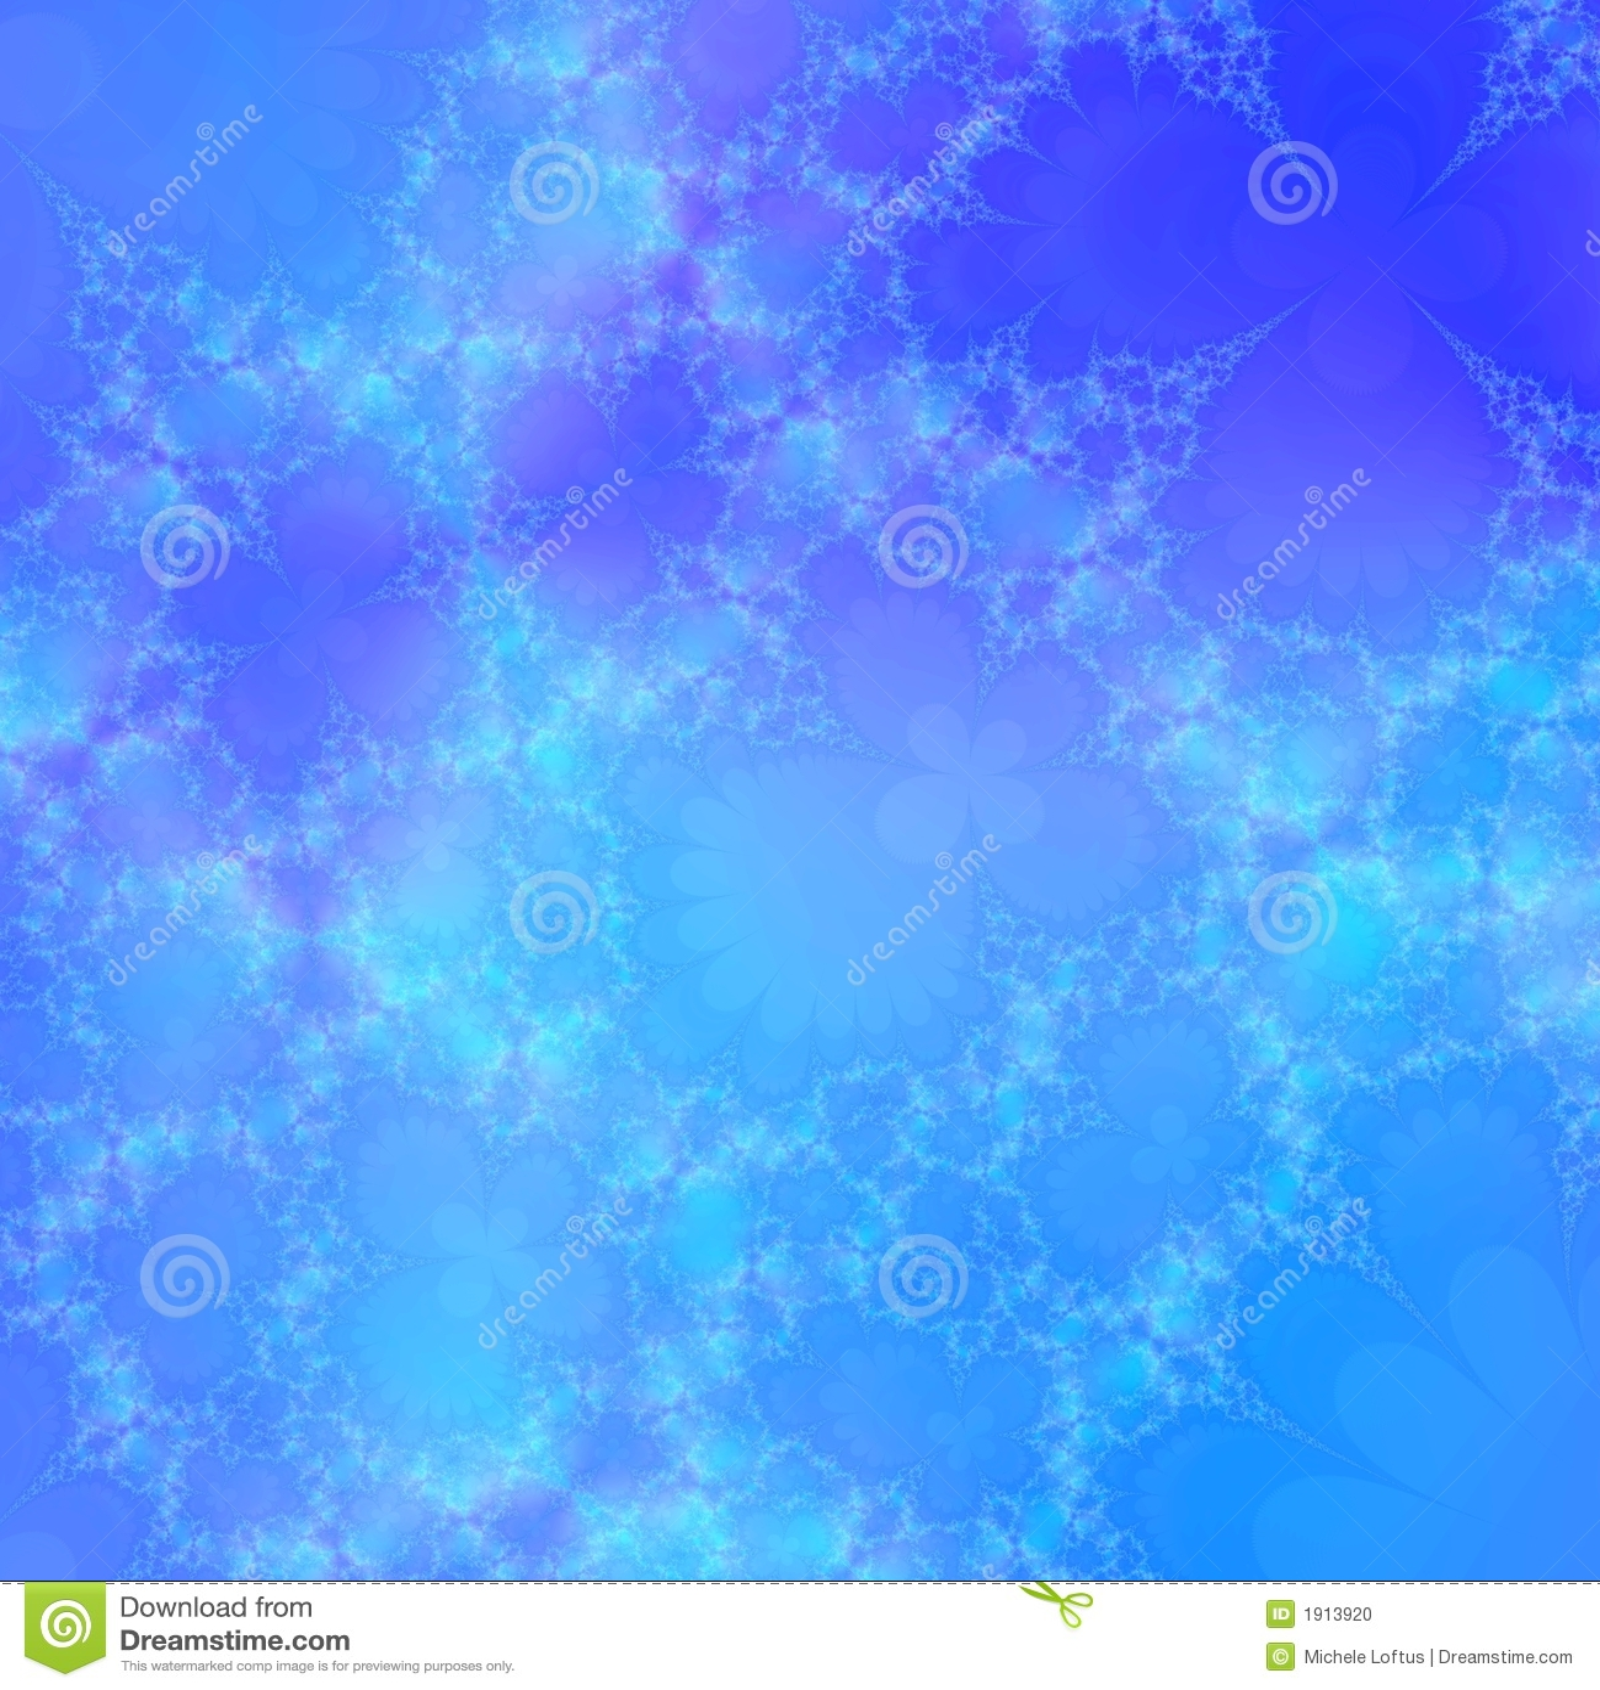 subtle sky blue background stock photo